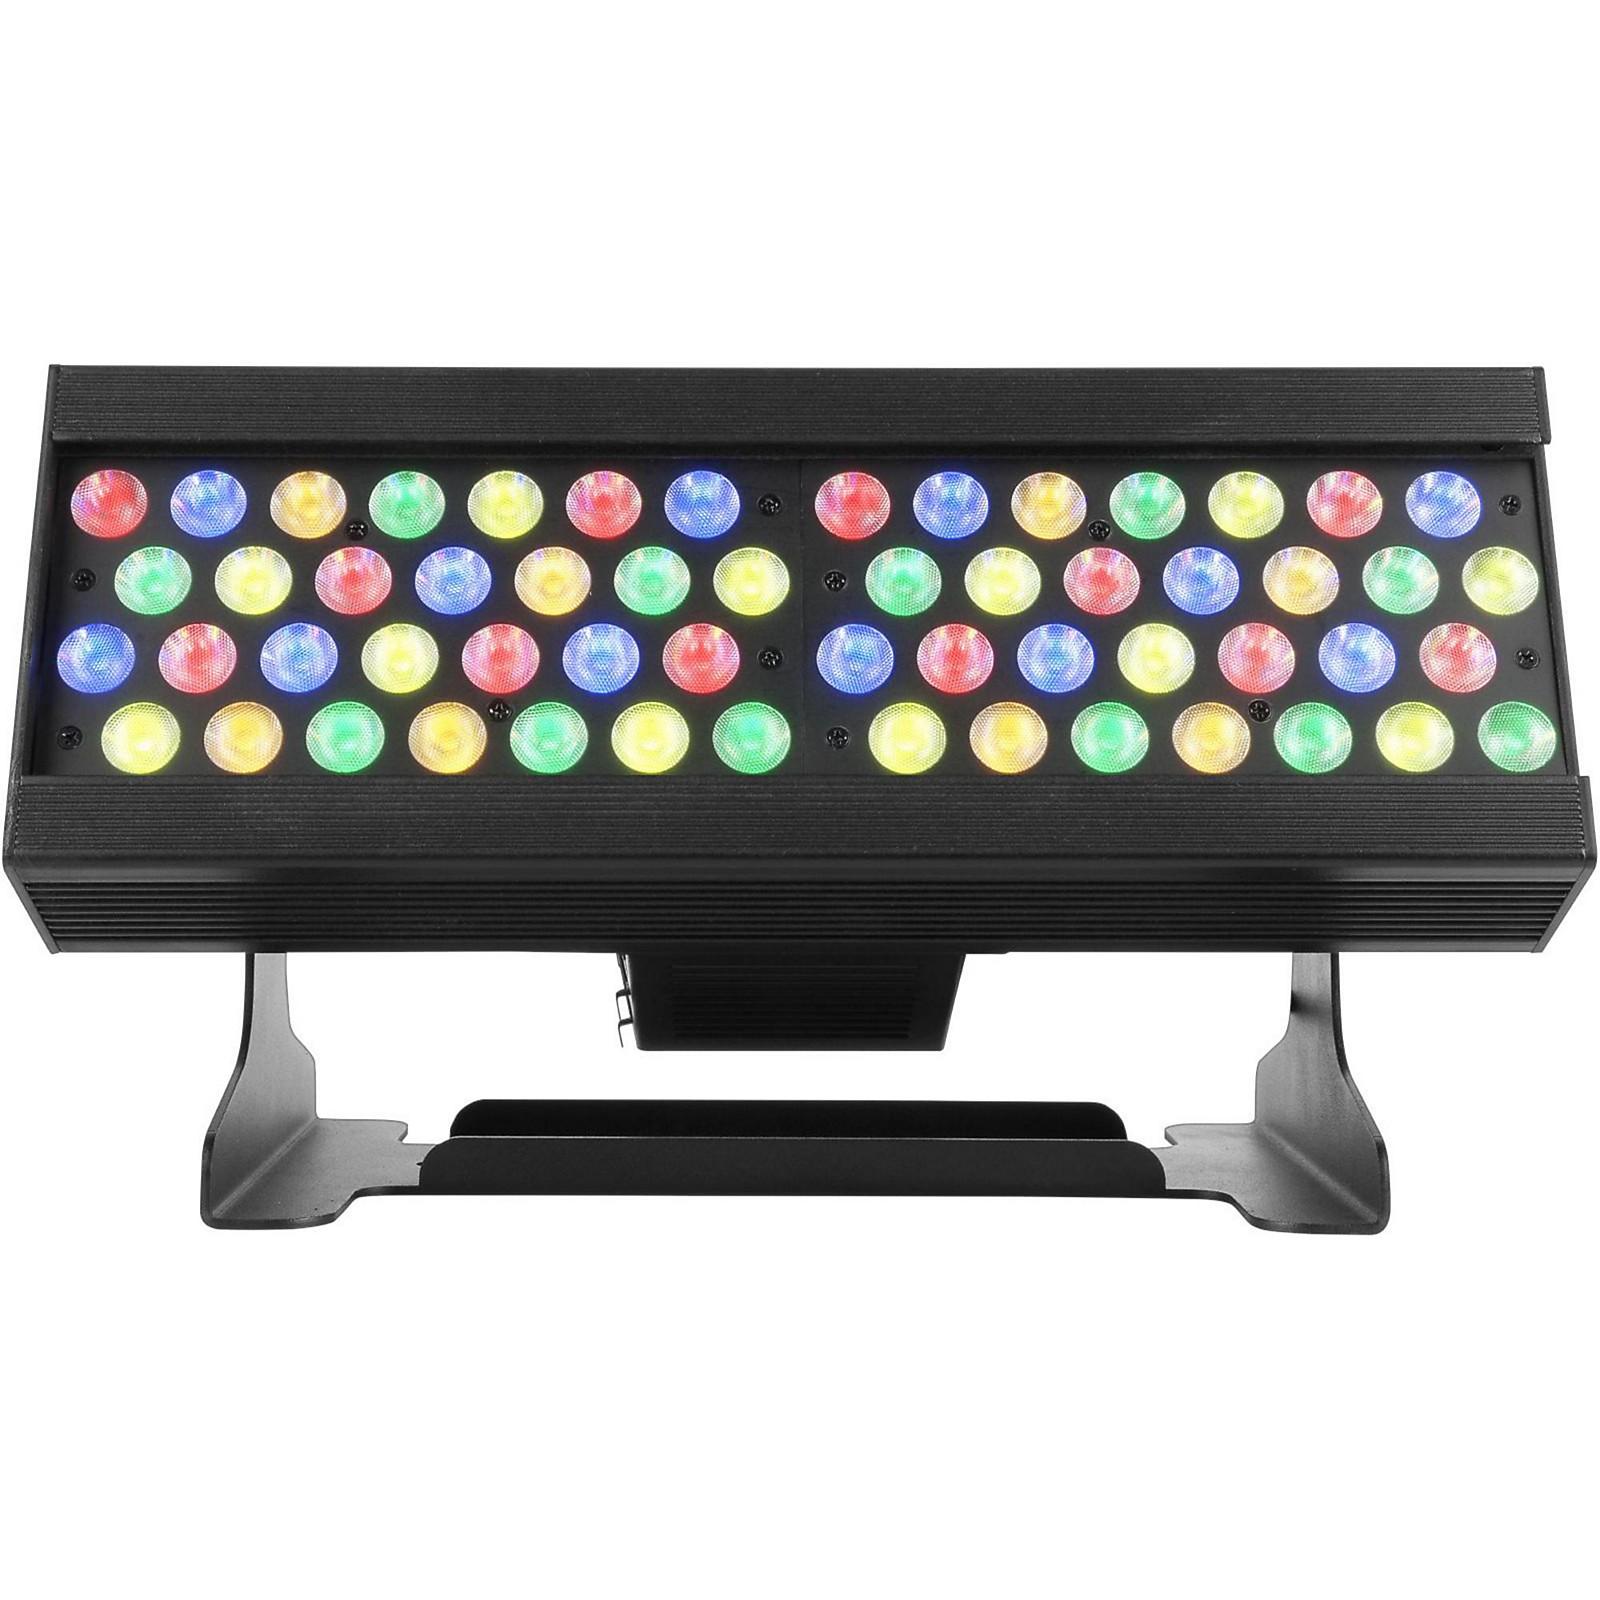 CHAUVET Professional Ovation B-565FC RGBAL LED Batten Style Static Bar Wash Light